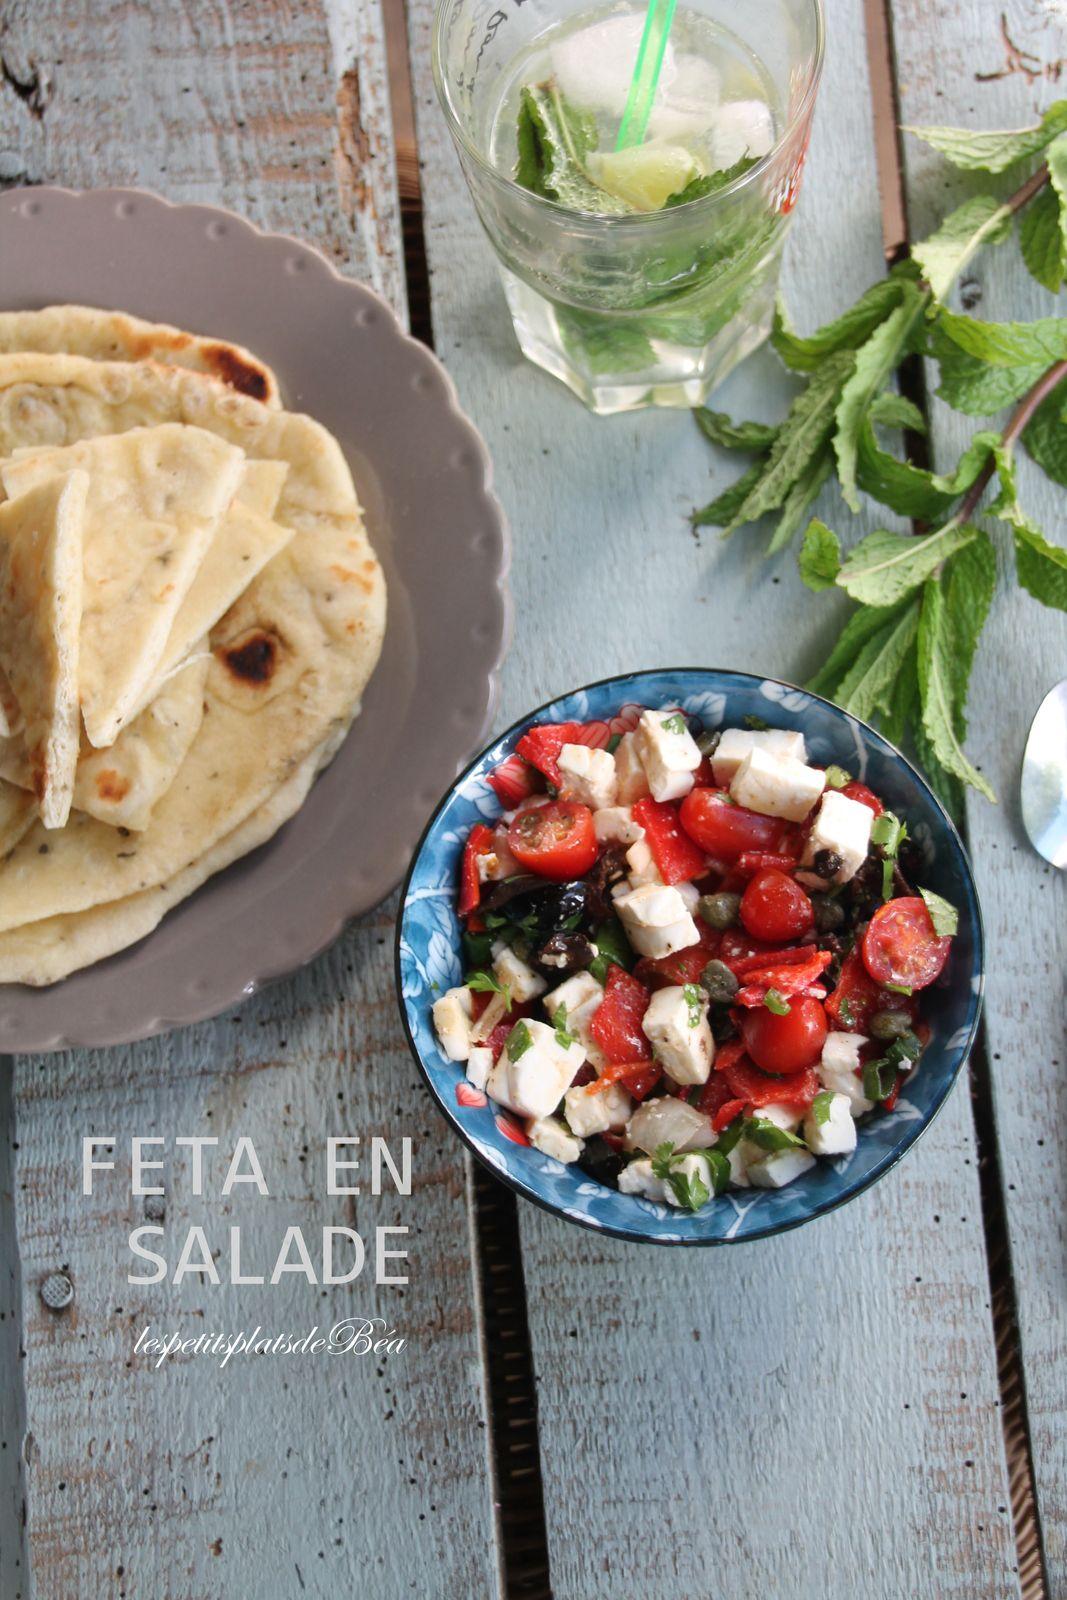 Feta en salade